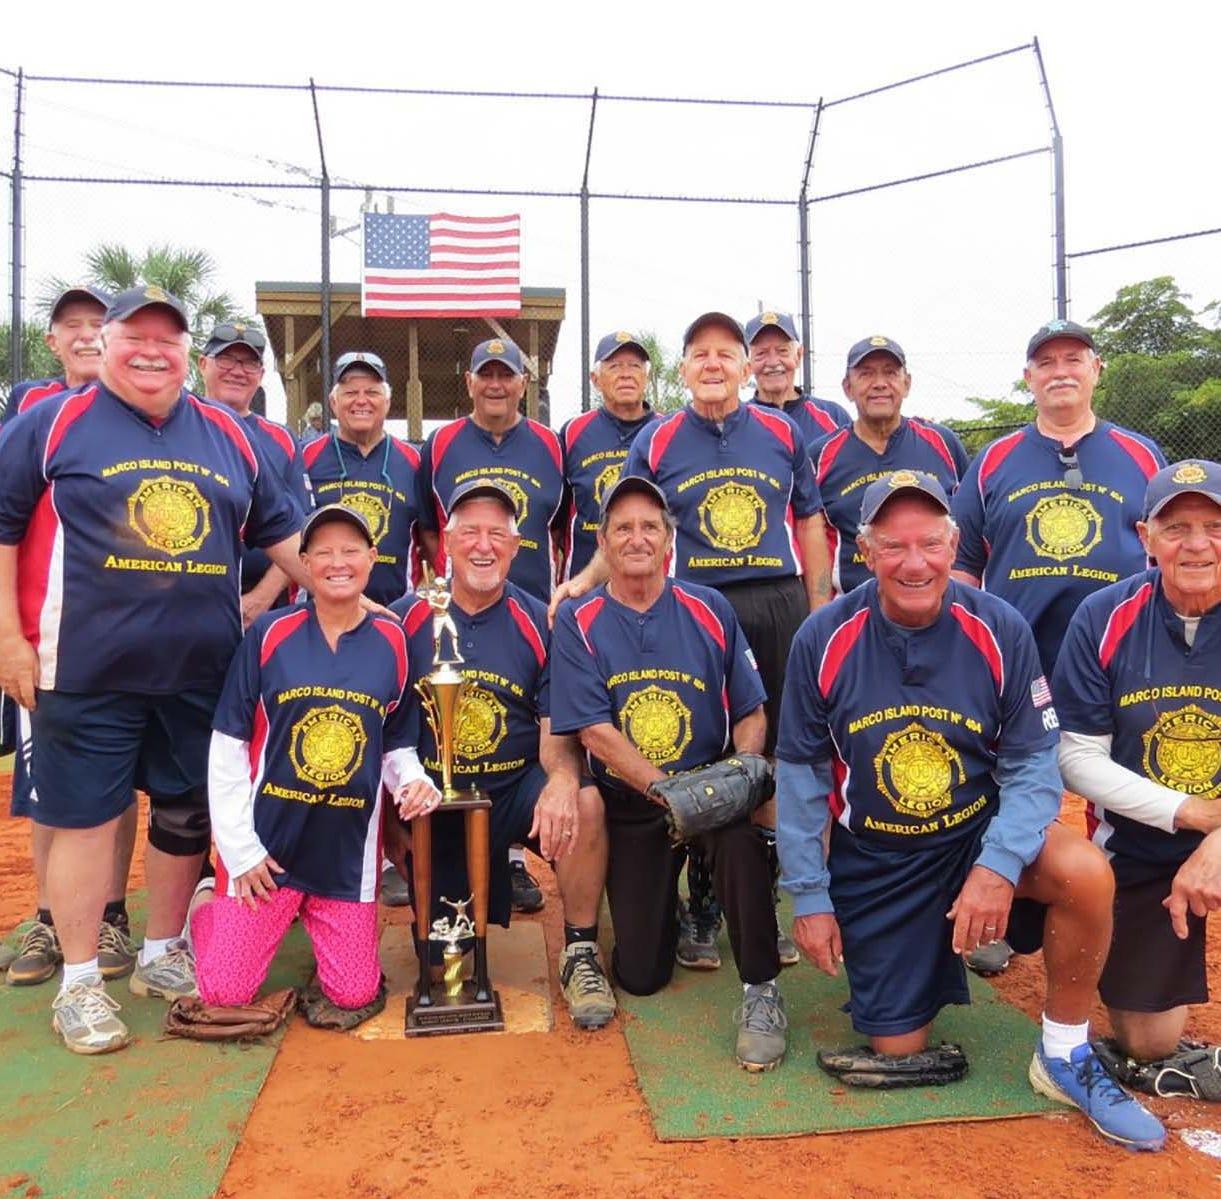 Senior Softball: American Legion Post is Gulf Coast divisional champions